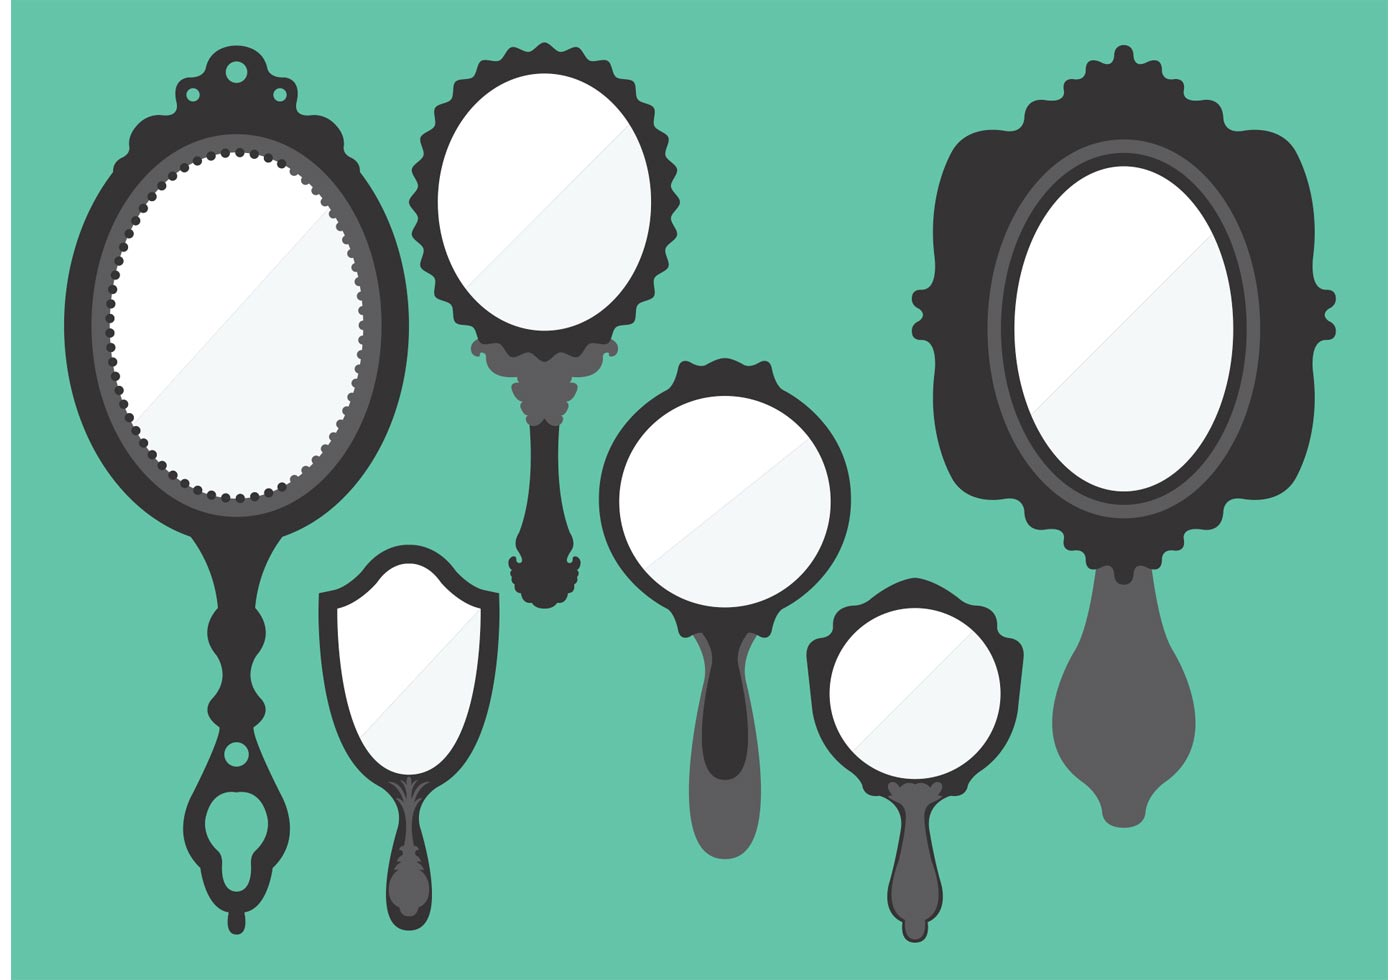 Vintage Hand Mirror Vectors - Download Free Vector Art ...